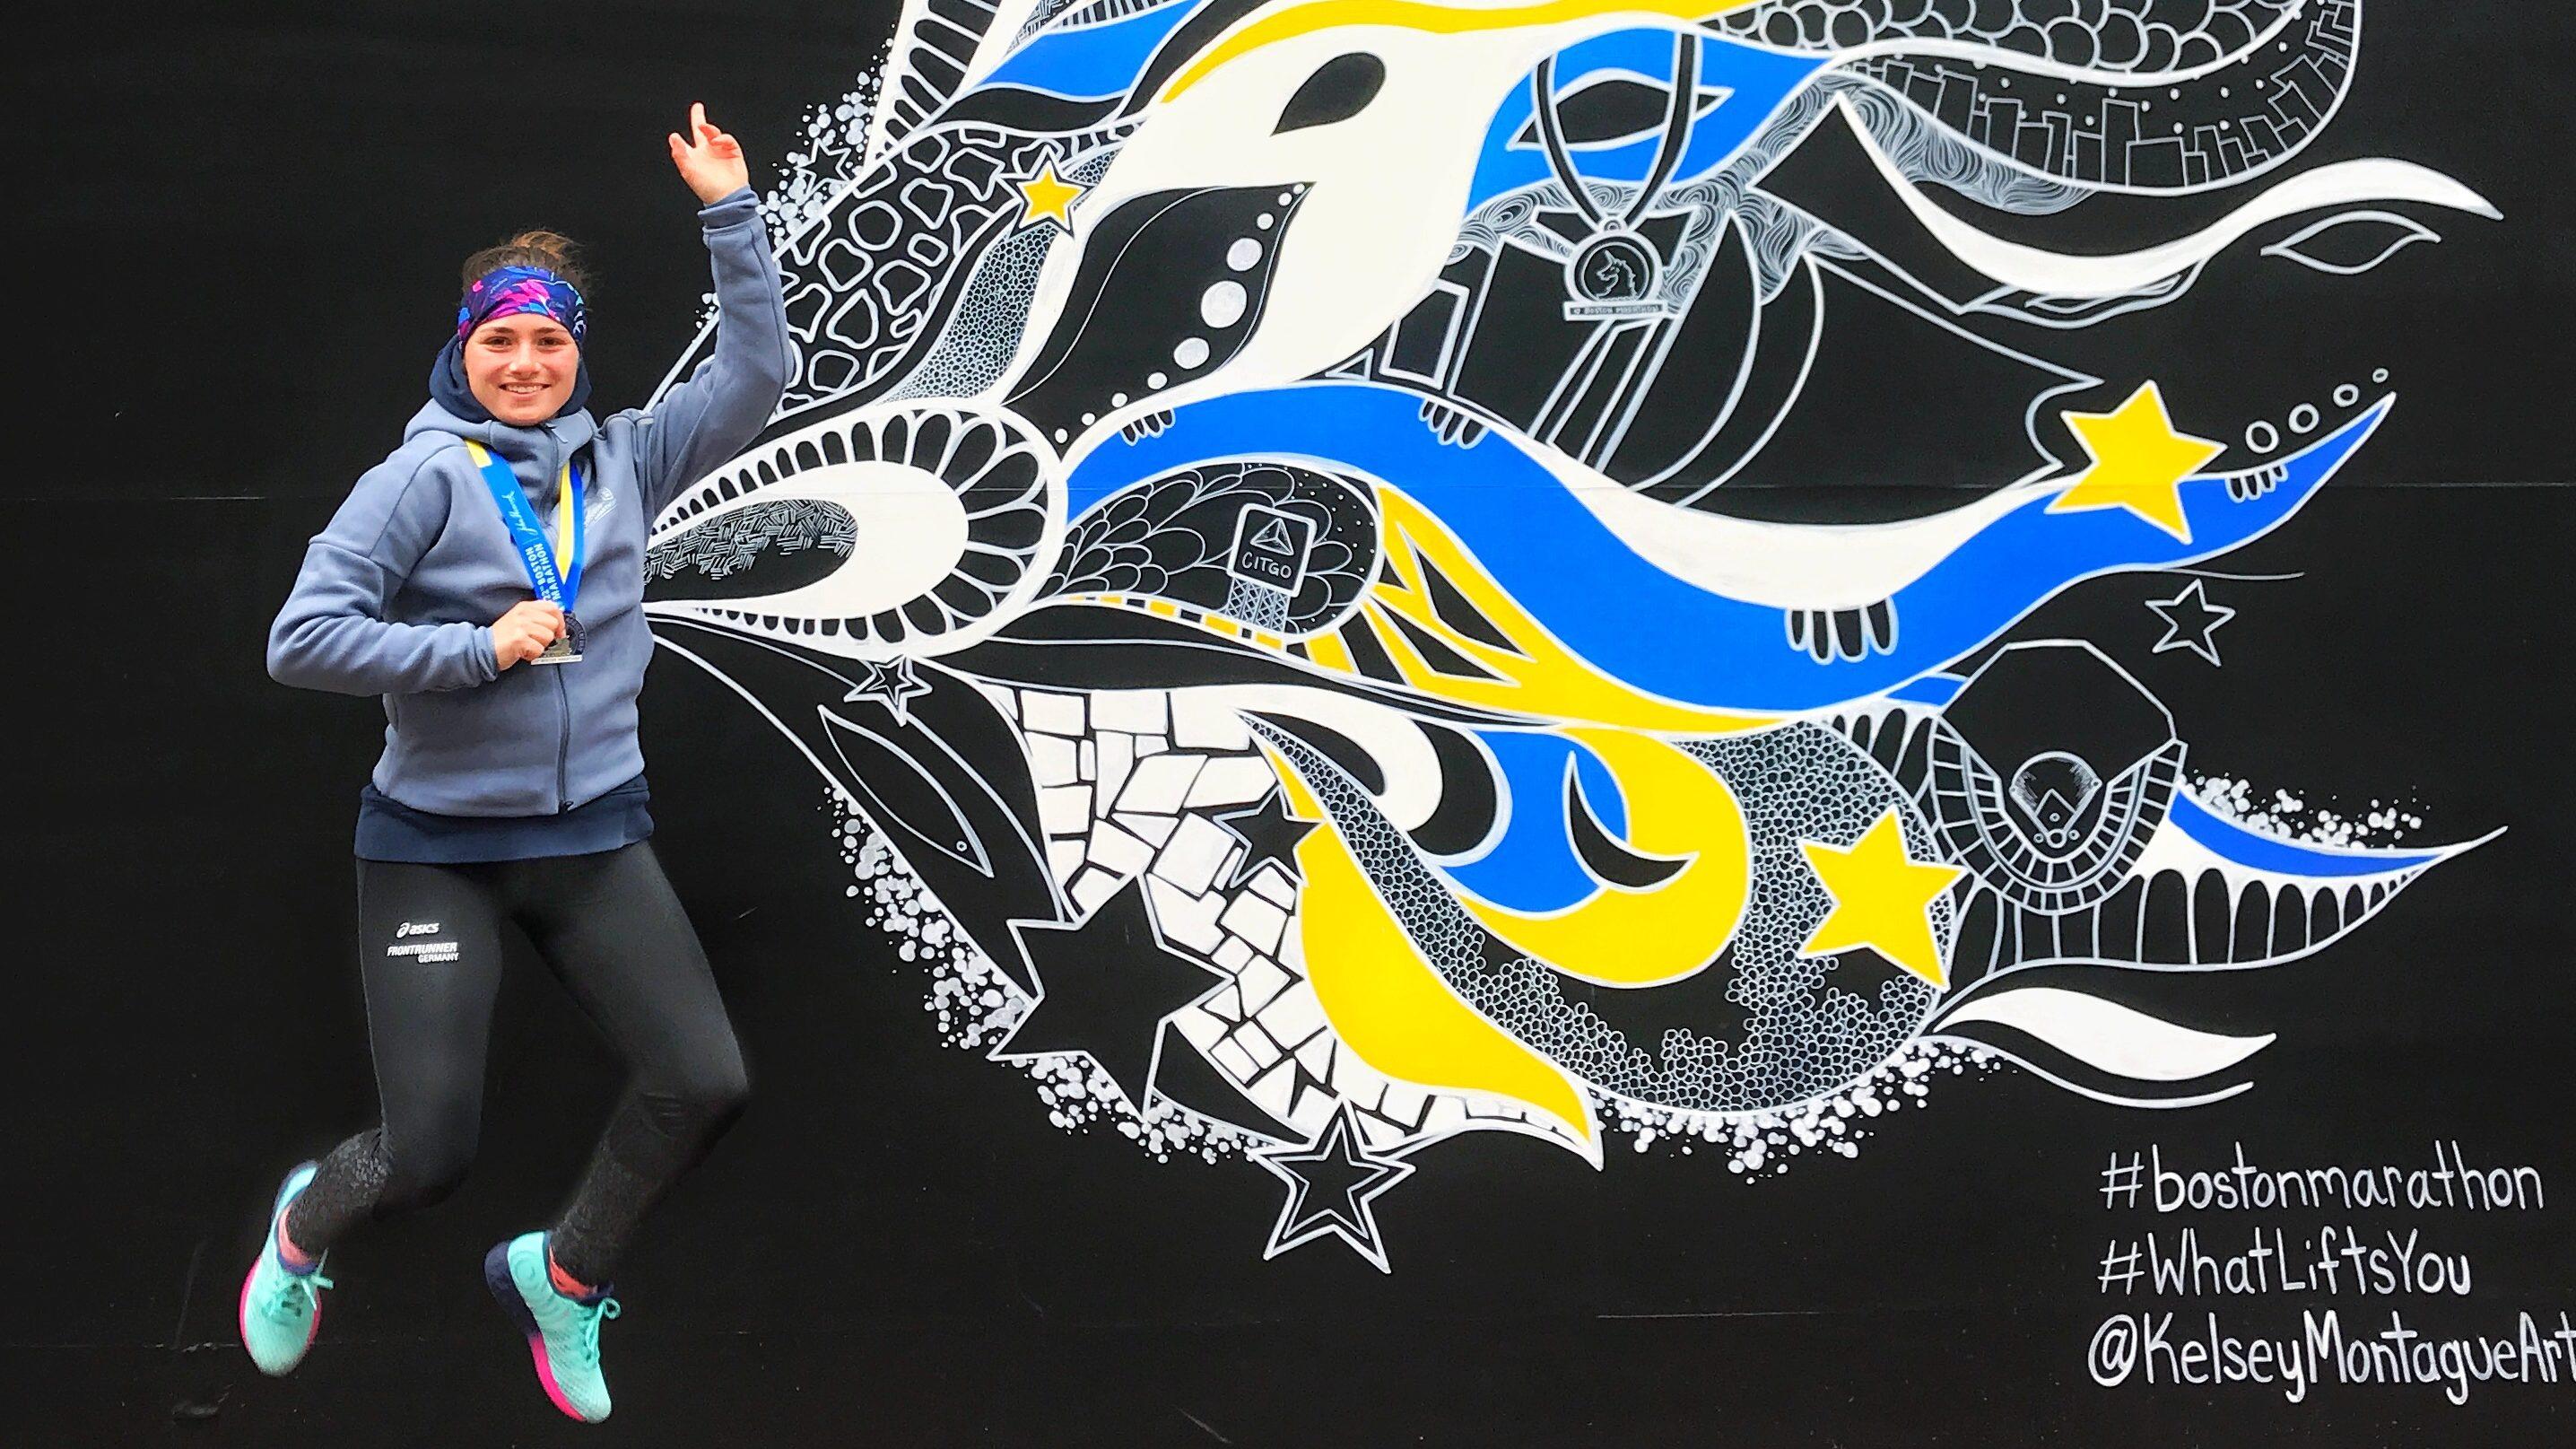 Achilles Running Autorin Susi beim Boston Marathon 2018